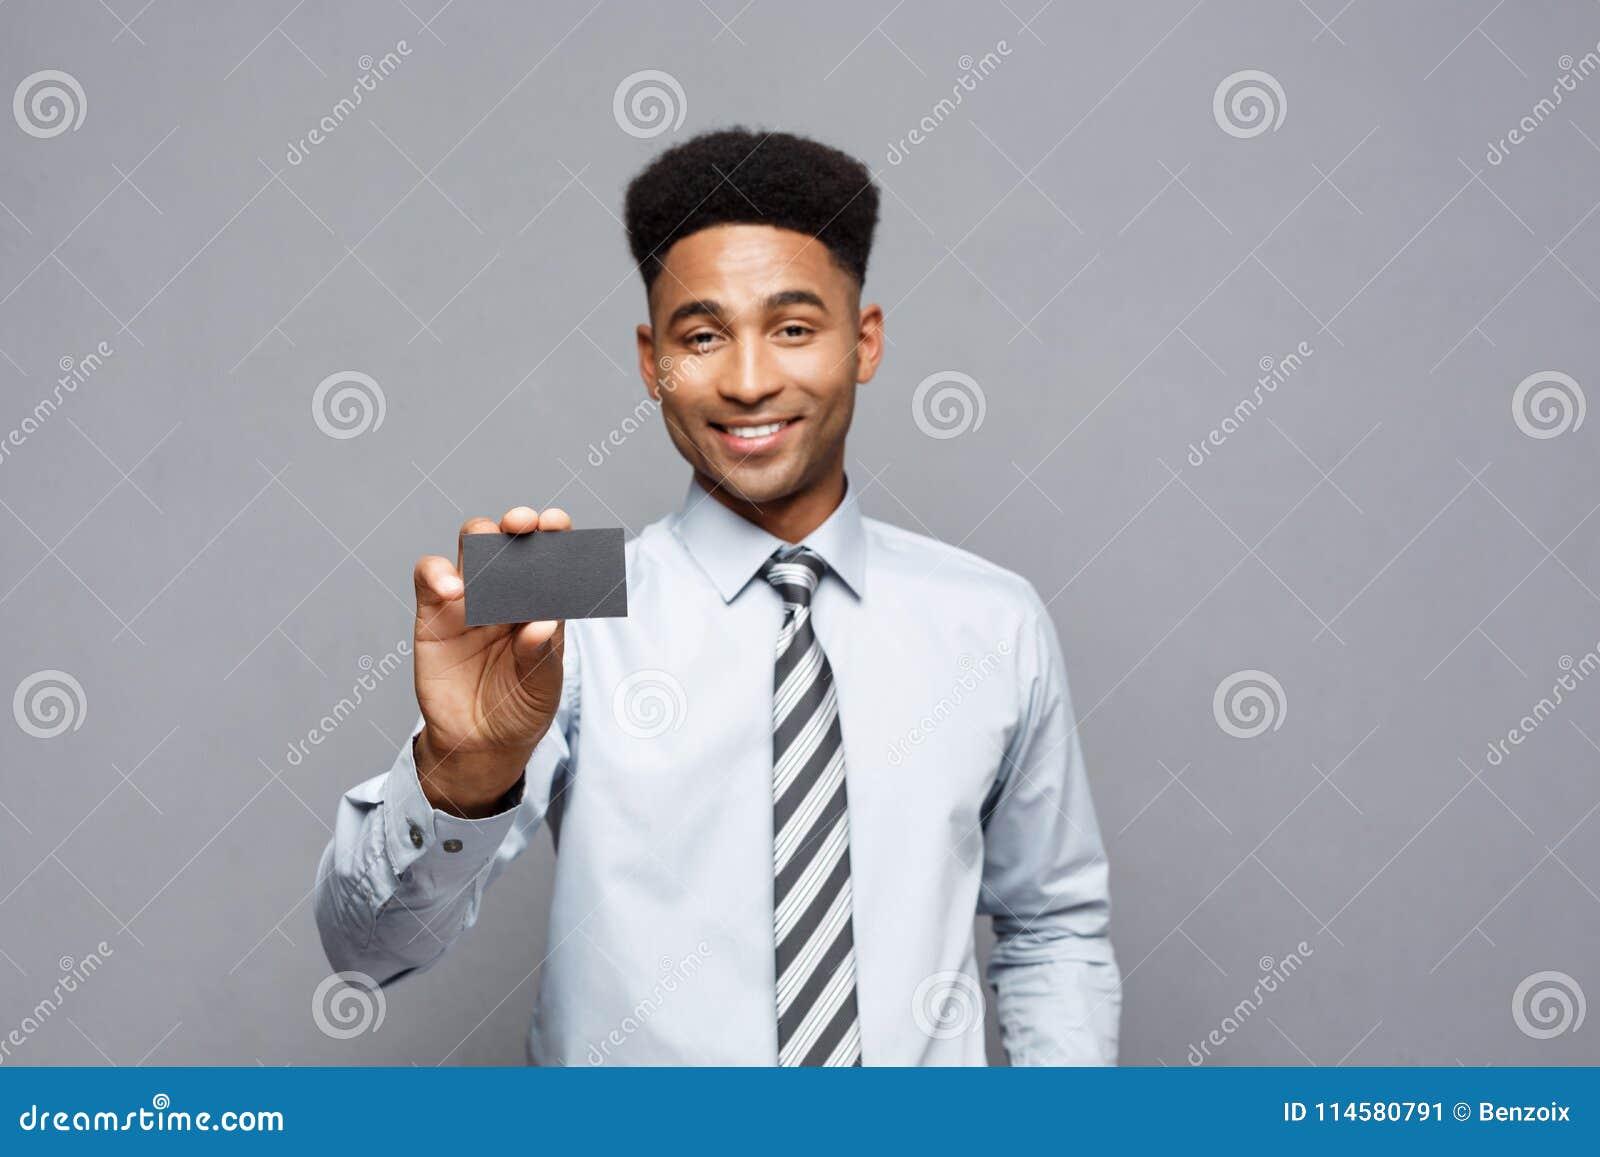 Bedrijfsconcept - Gelukkige knappe professionele Afrikaanse Amerikaanse zakenman die naamkaart tonen aan cliënt